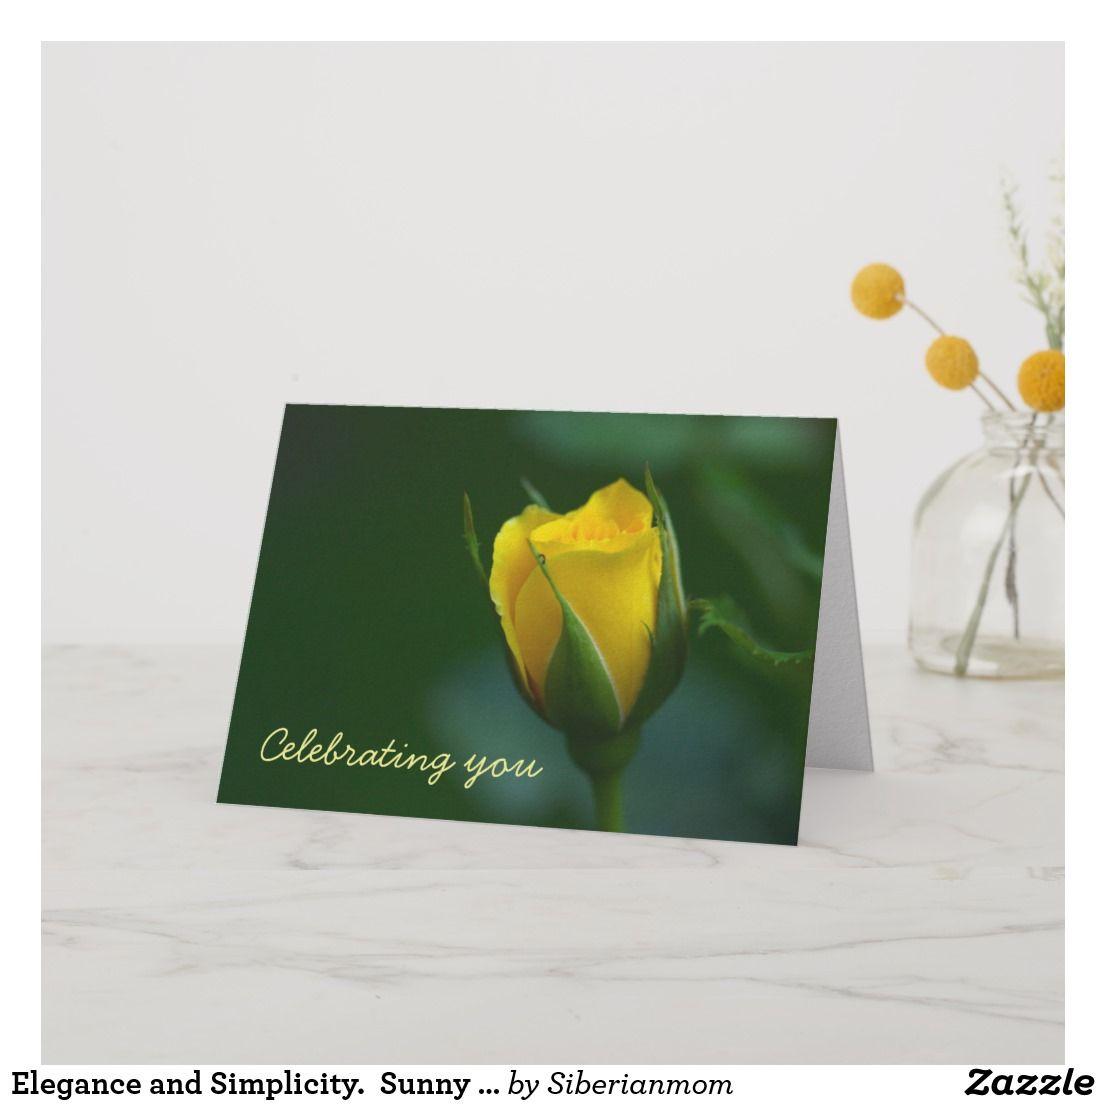 Sunny Birthday Greetings Card Cardsfunny Cardsgreeting Cardshappy Cardbirthday Greeting Cardsonline Cards